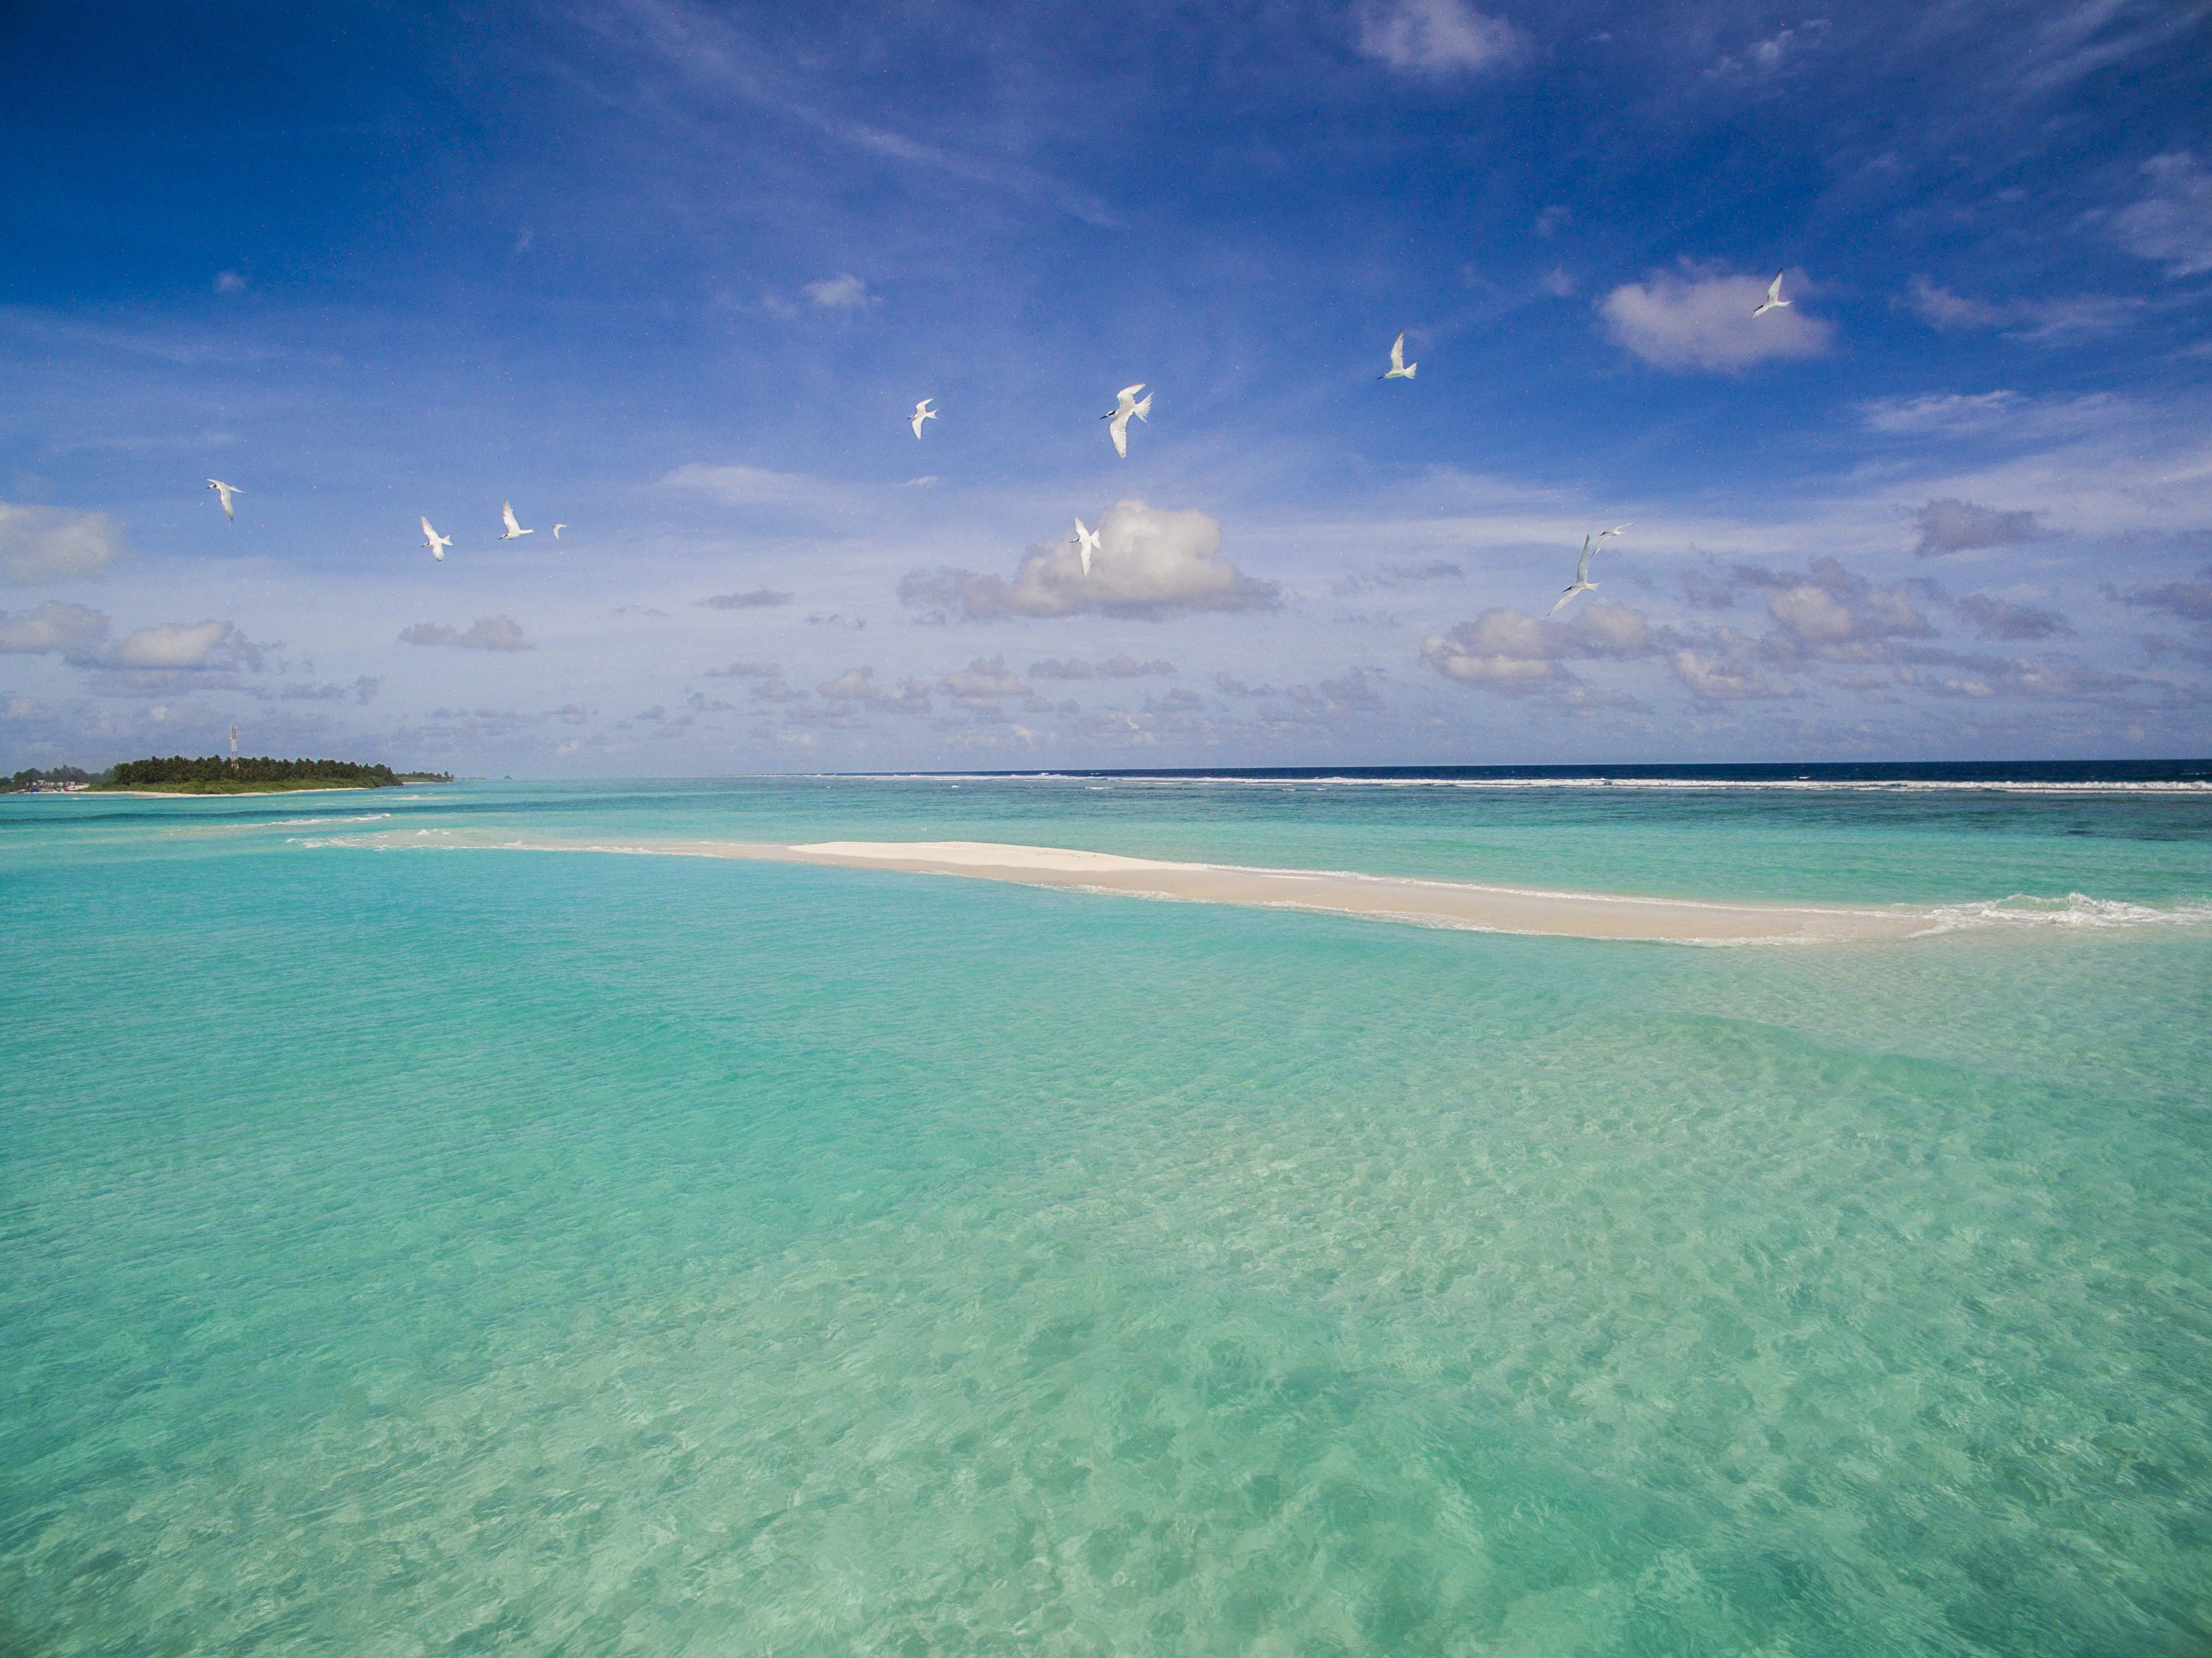 Lacabana Maldives Sand Bank (2)